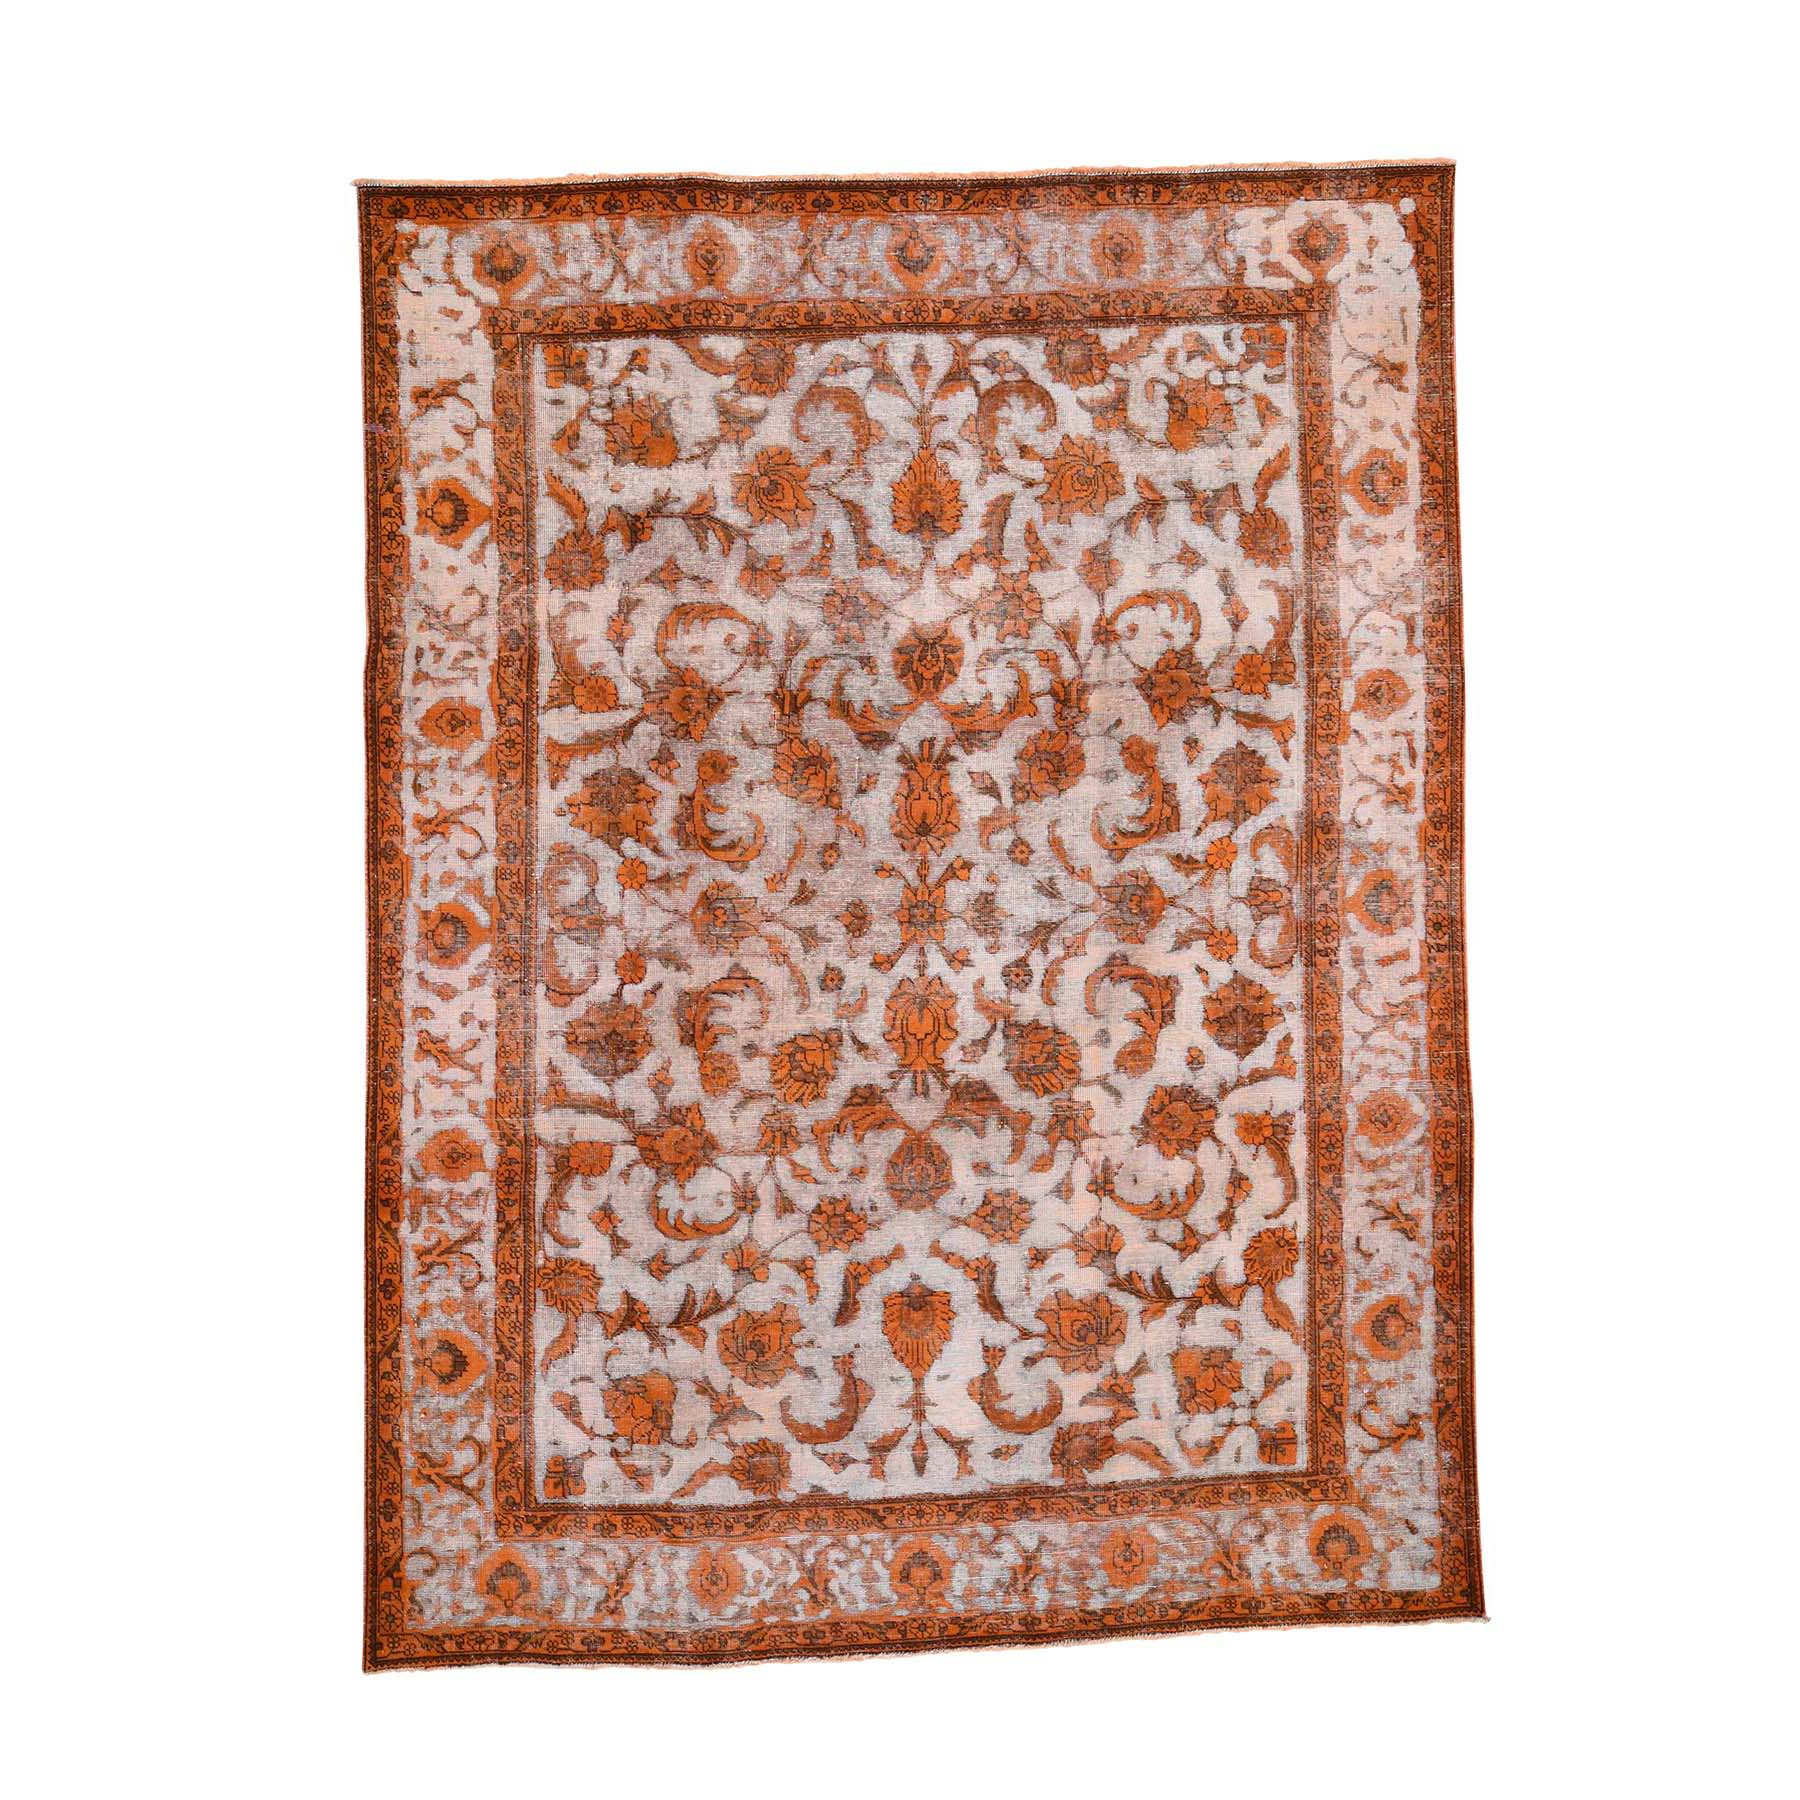 "8'1""x10'9"" Orange Overdyed Persian Tabriz Barjasta Vintage Hand-Knotted Oriental Rug"